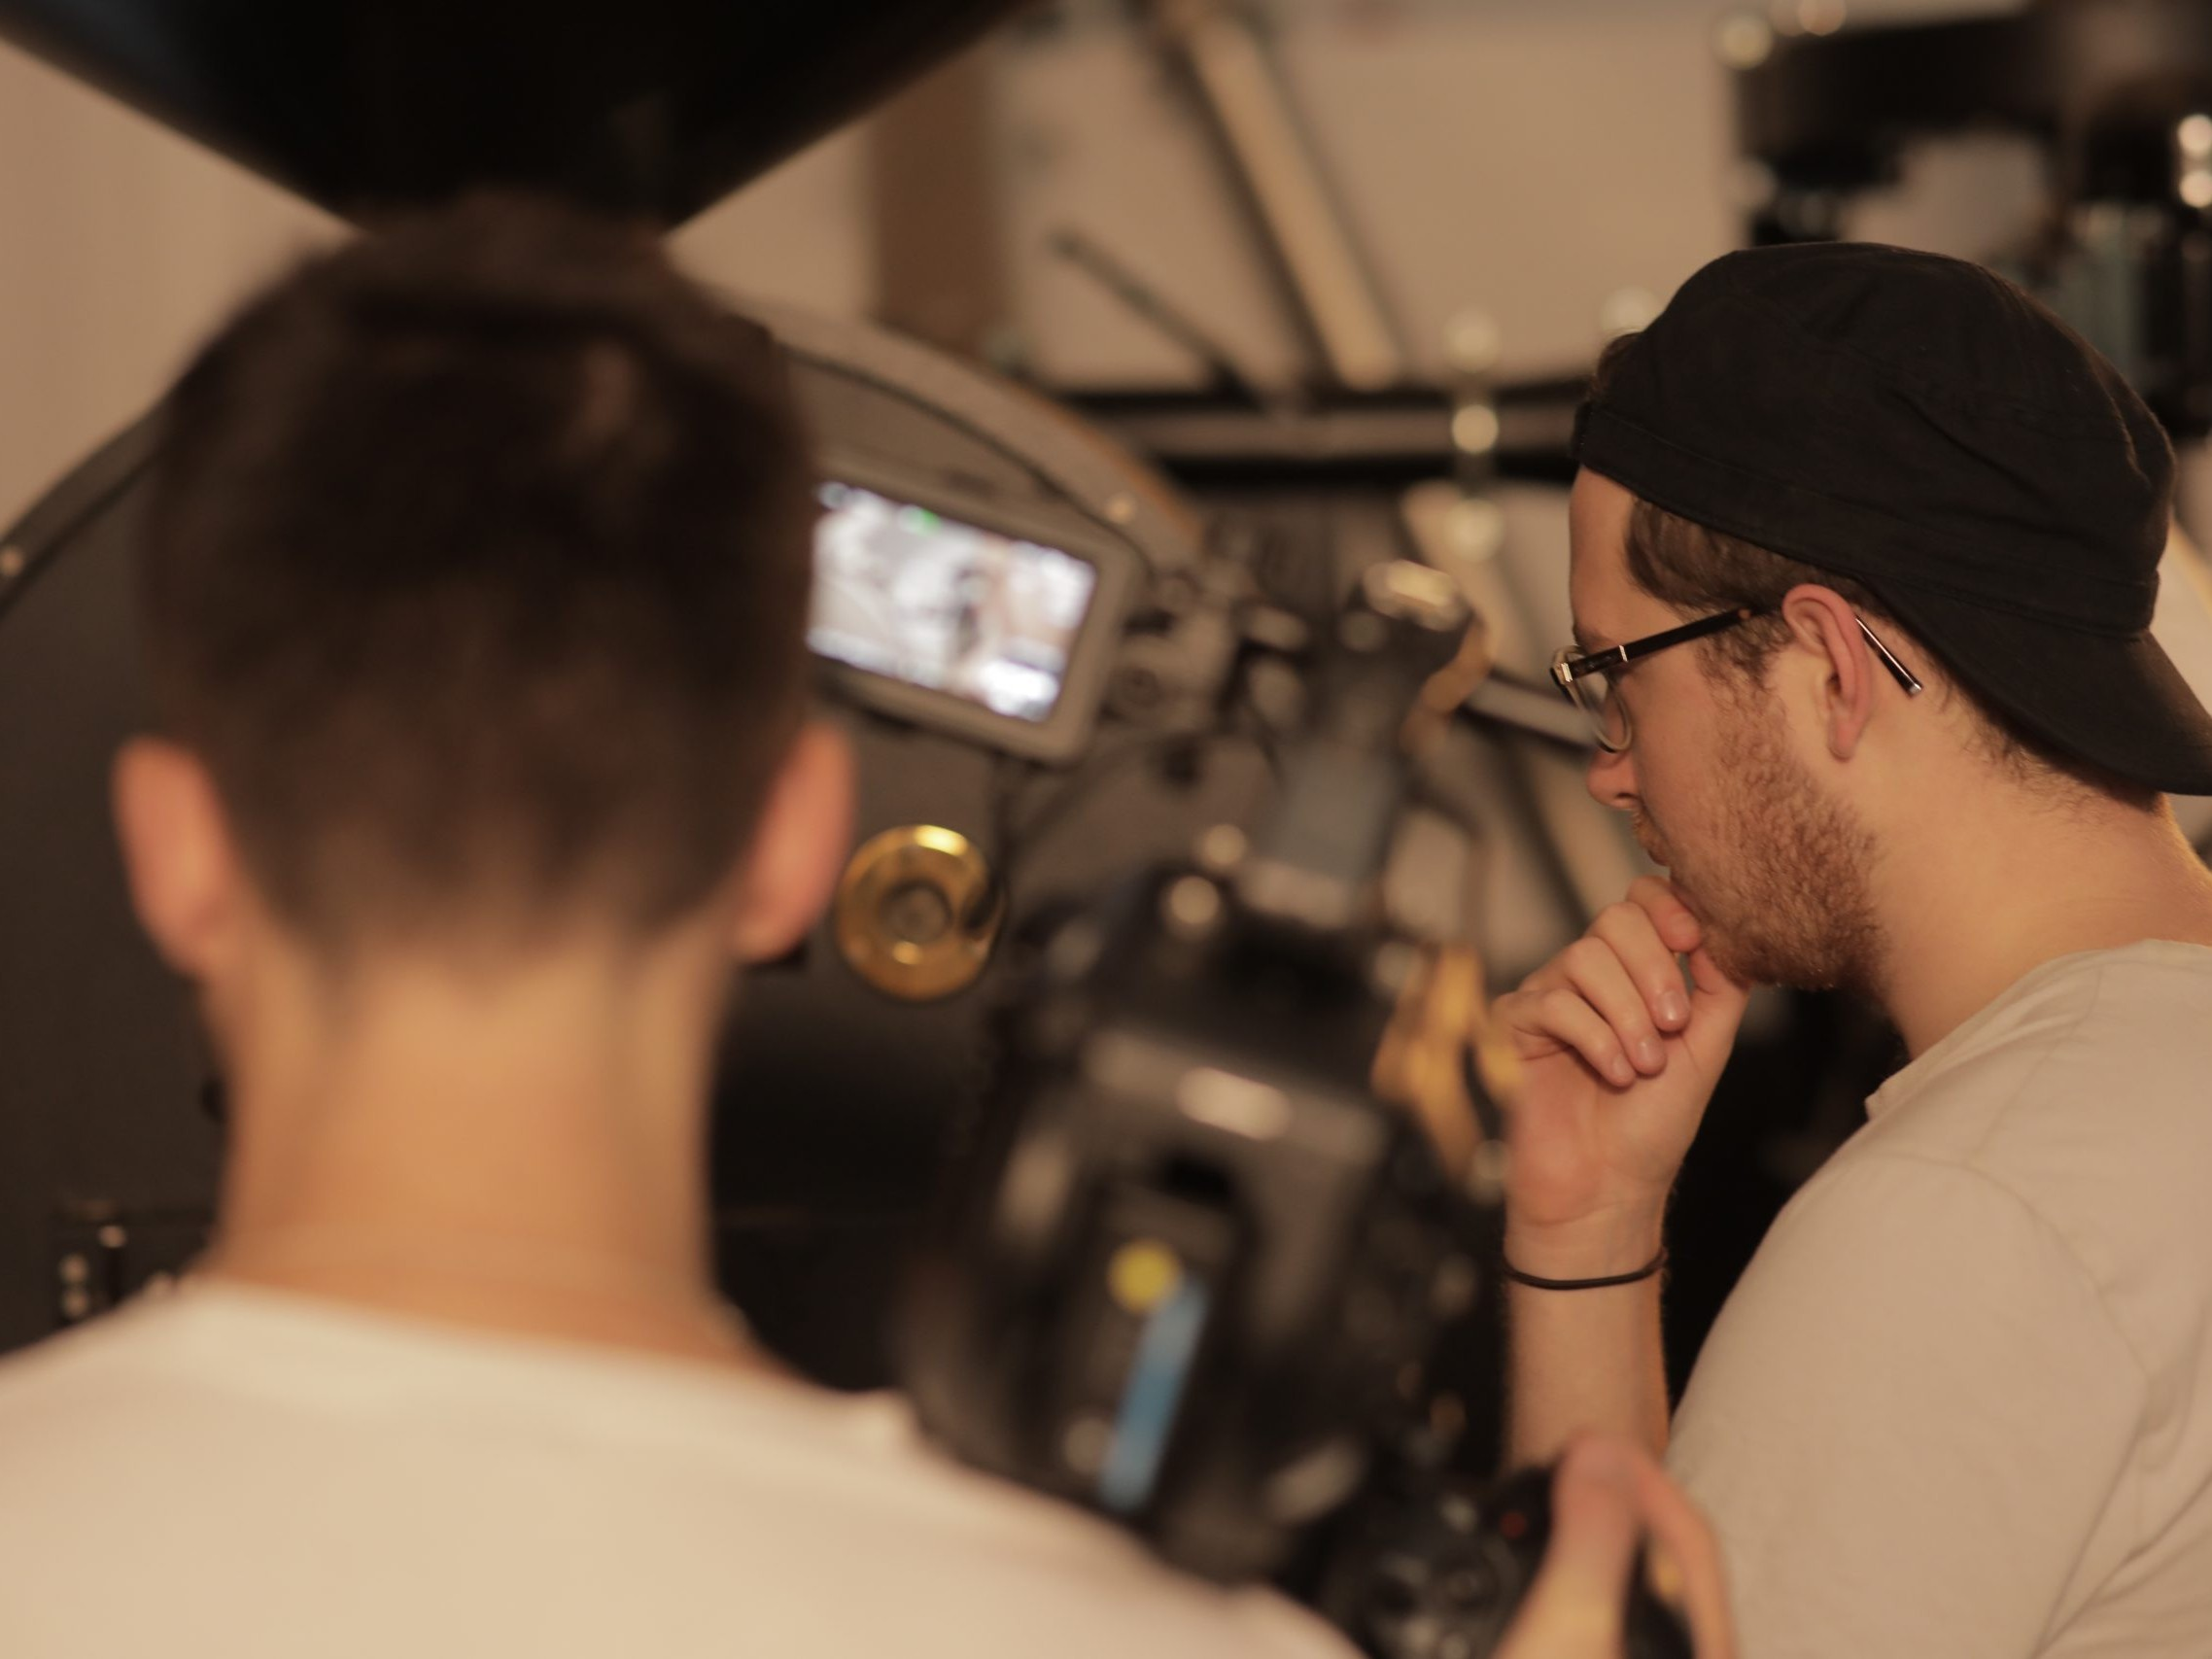 Habitual media - behind the scenes